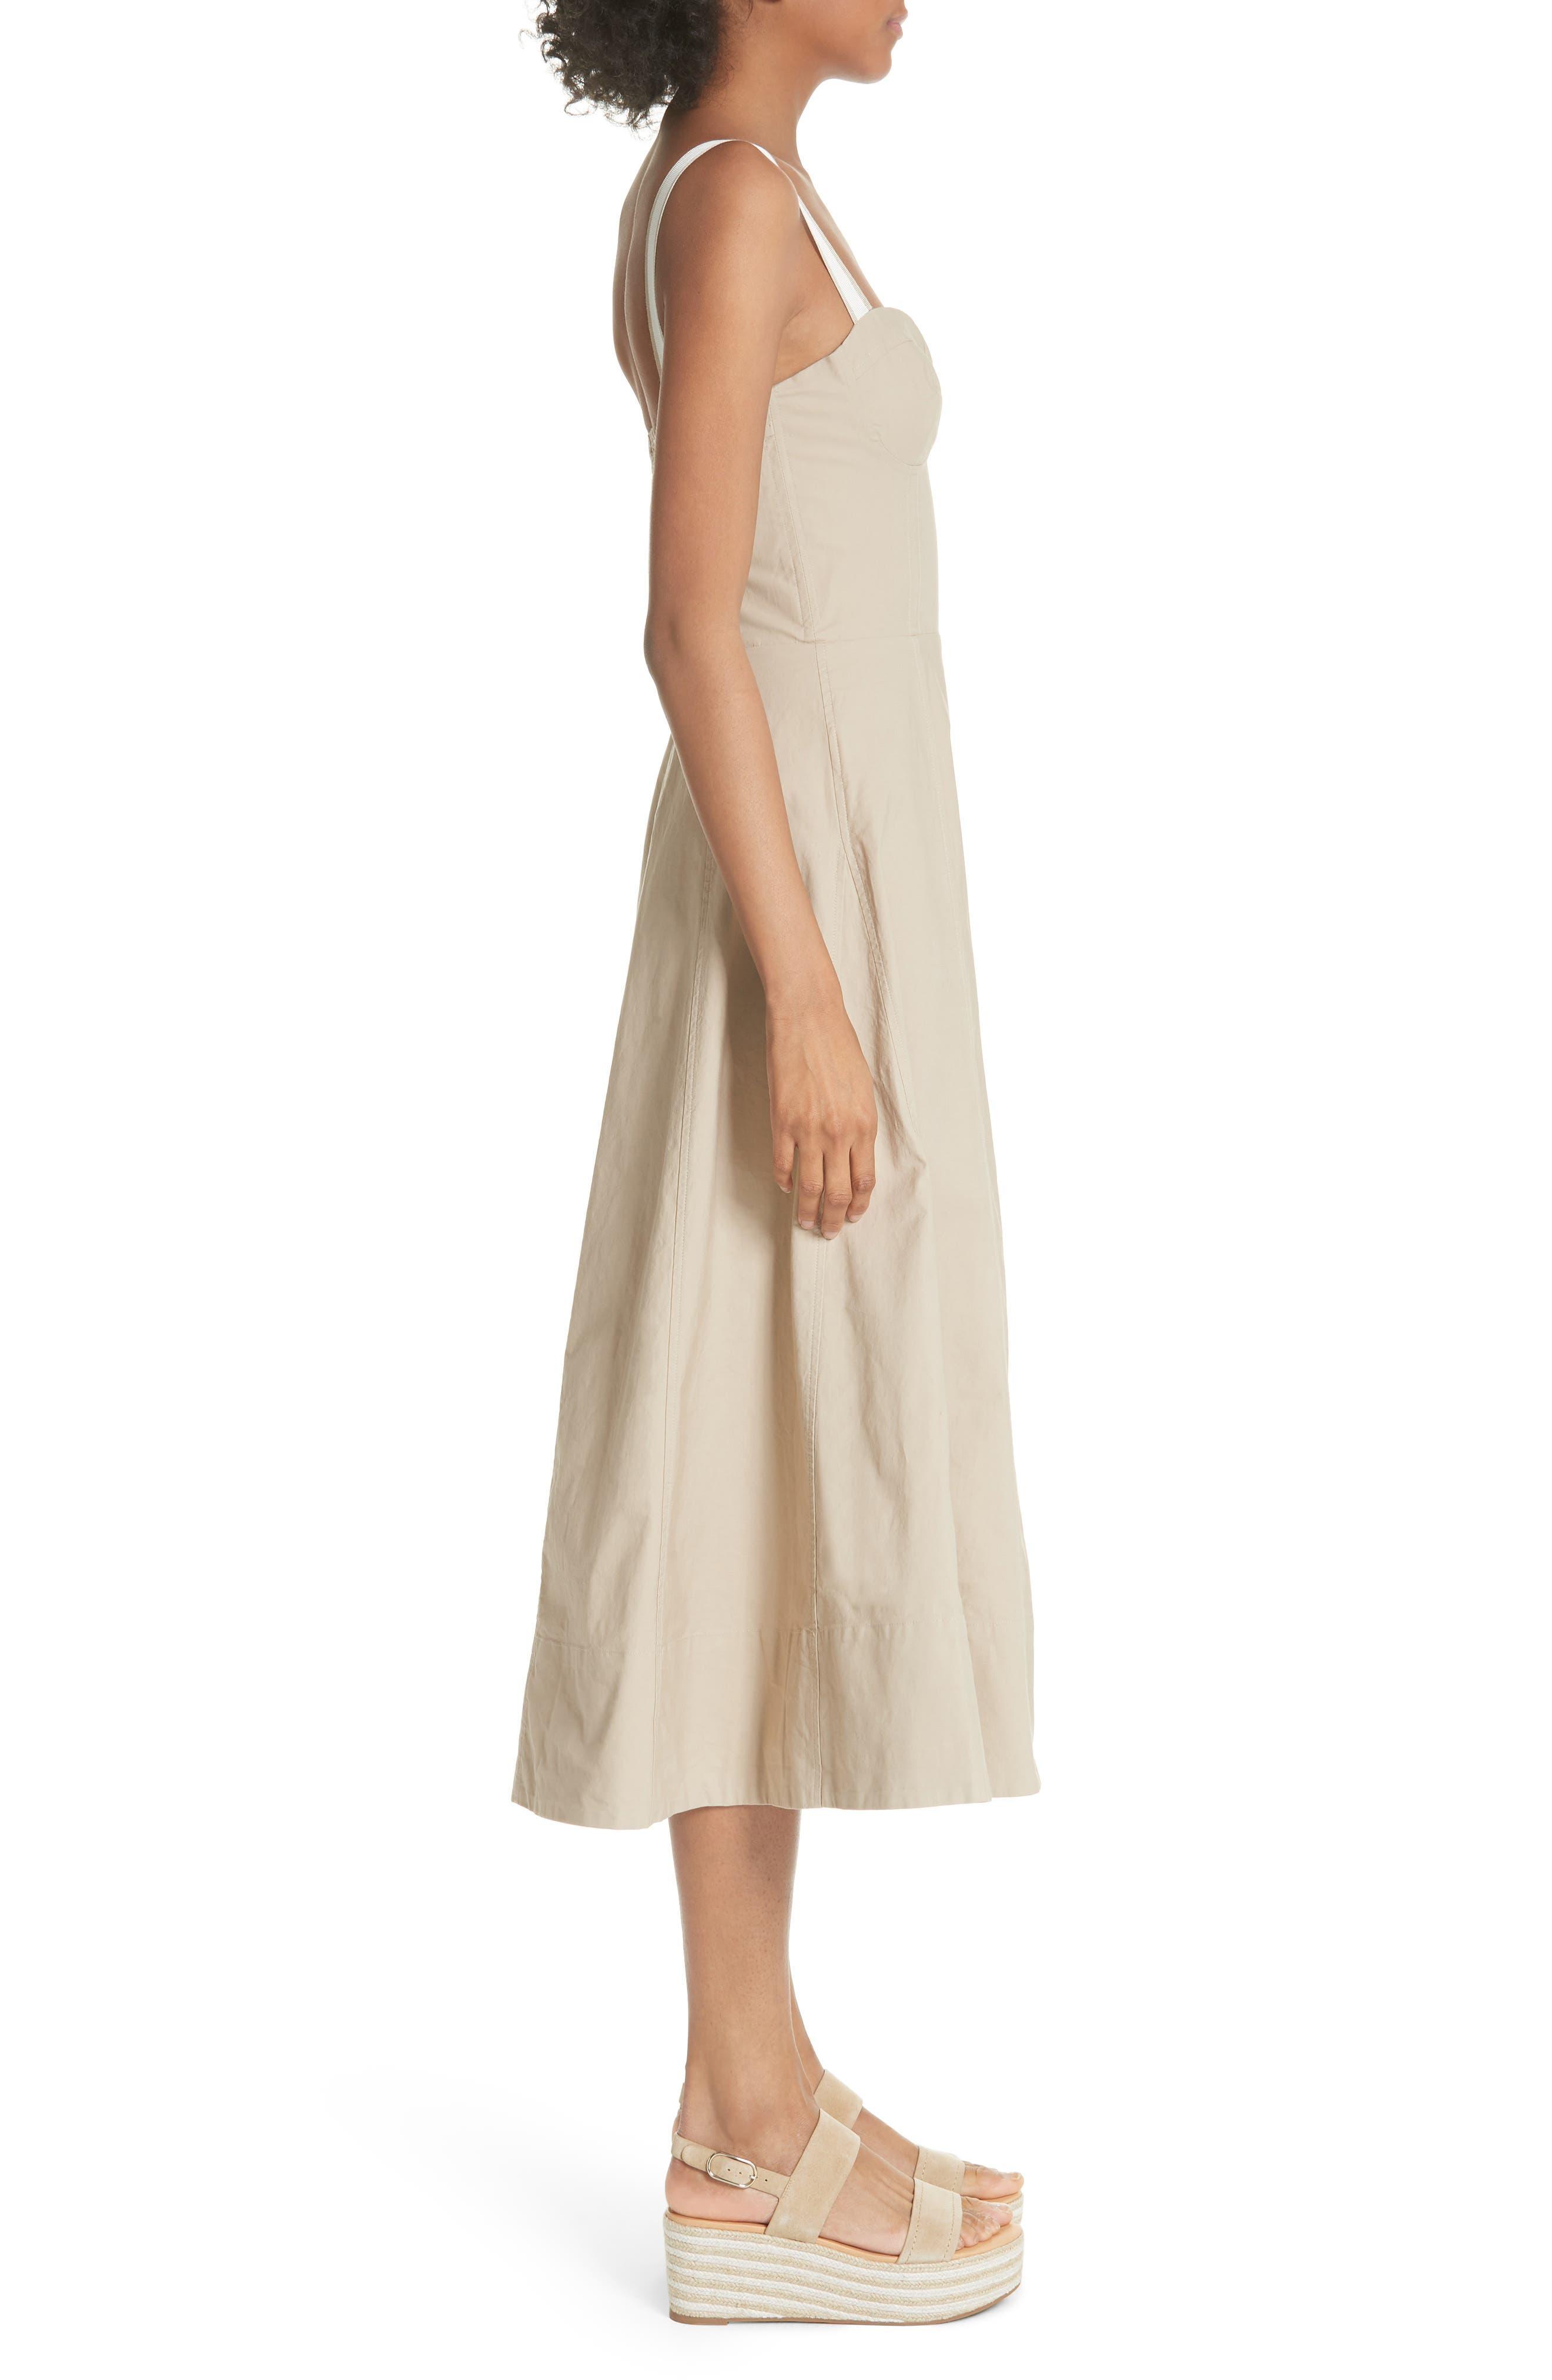 Briel Midi Dress,                             Alternate thumbnail 3, color,                             Light Sand